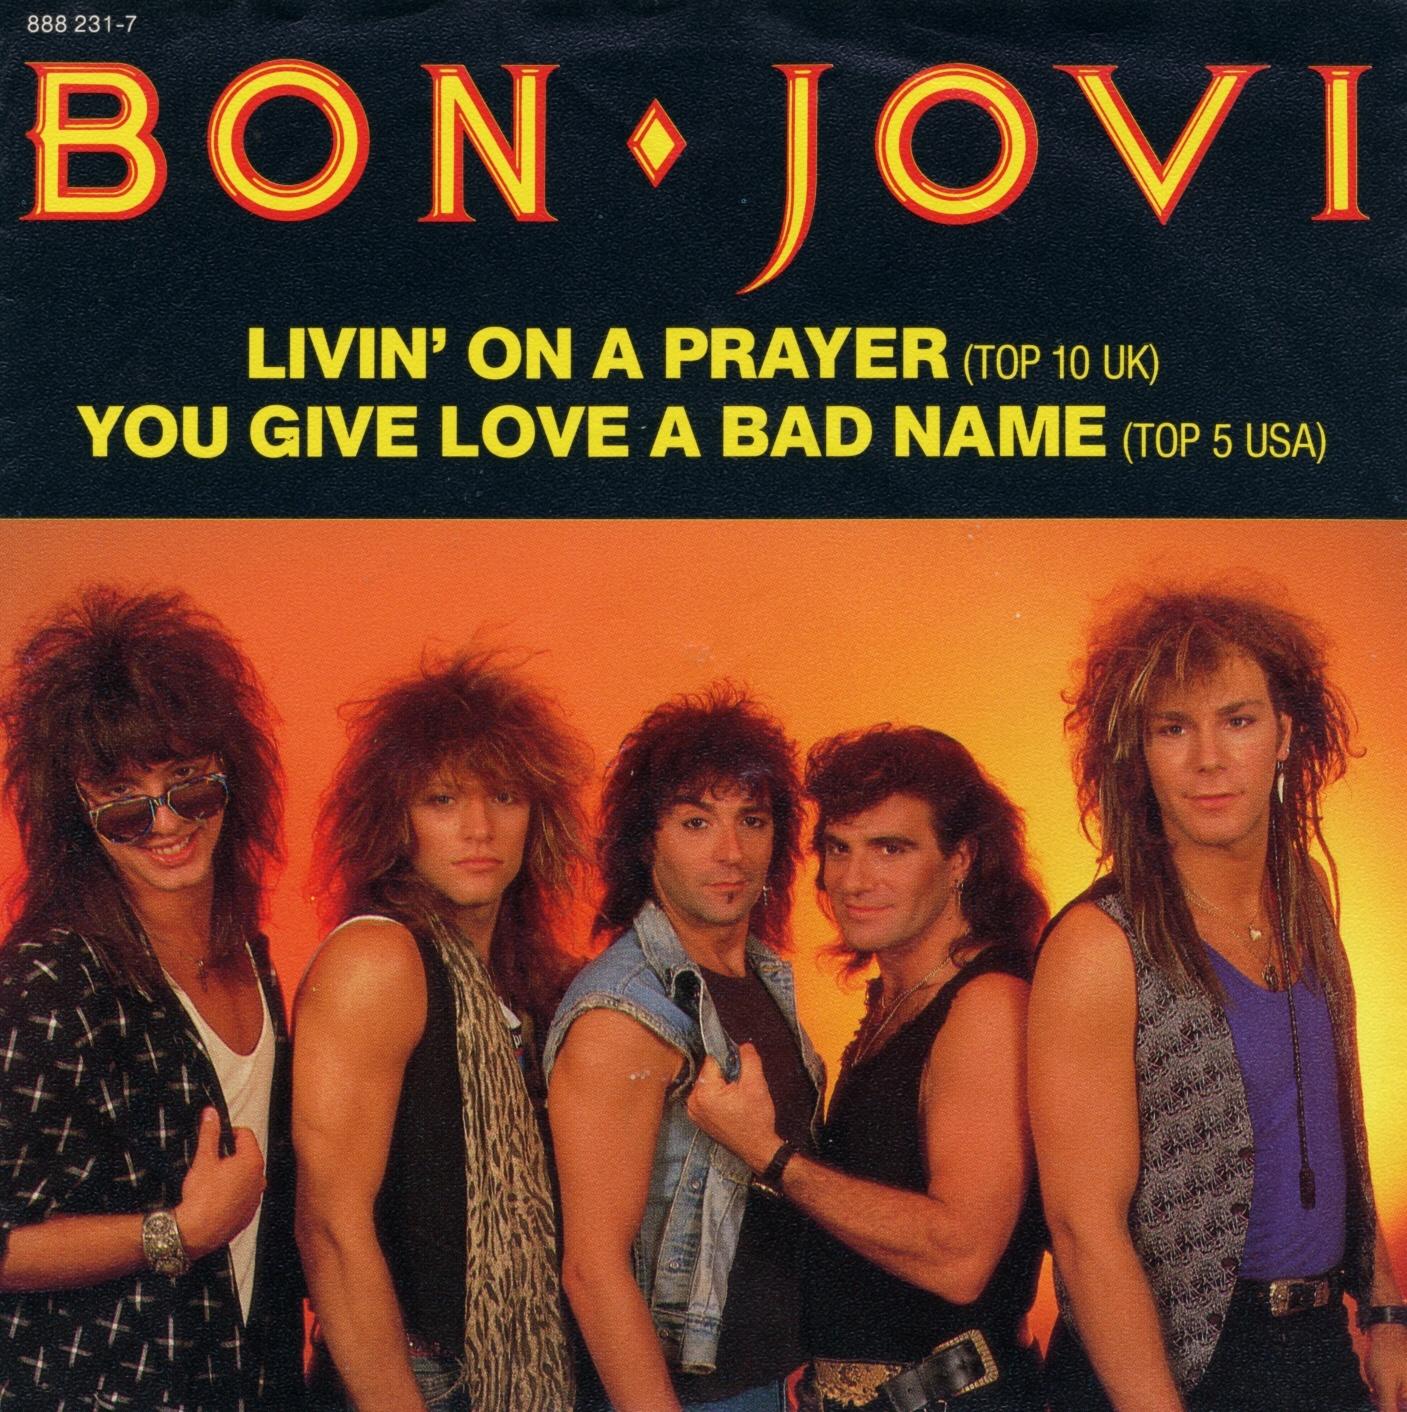 Livin' on a prayer (Foto: Bon Jovi)